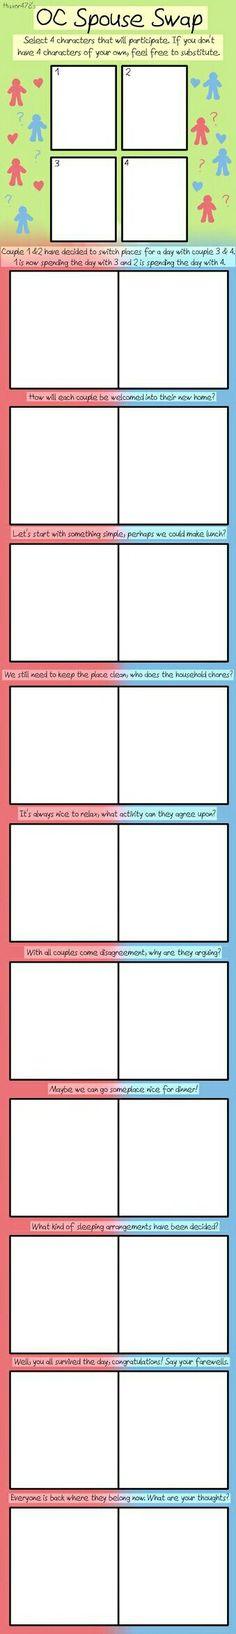 OC Spouse Swap: Blank Meme by on DeviantArt - - Drawing Meme, Ship Drawing, Drawing Prompt, Drawing Reference Poses, Drawing Tips, Art Reference, Drawing Ideas, Art Style Challenge, Drawing Challenge